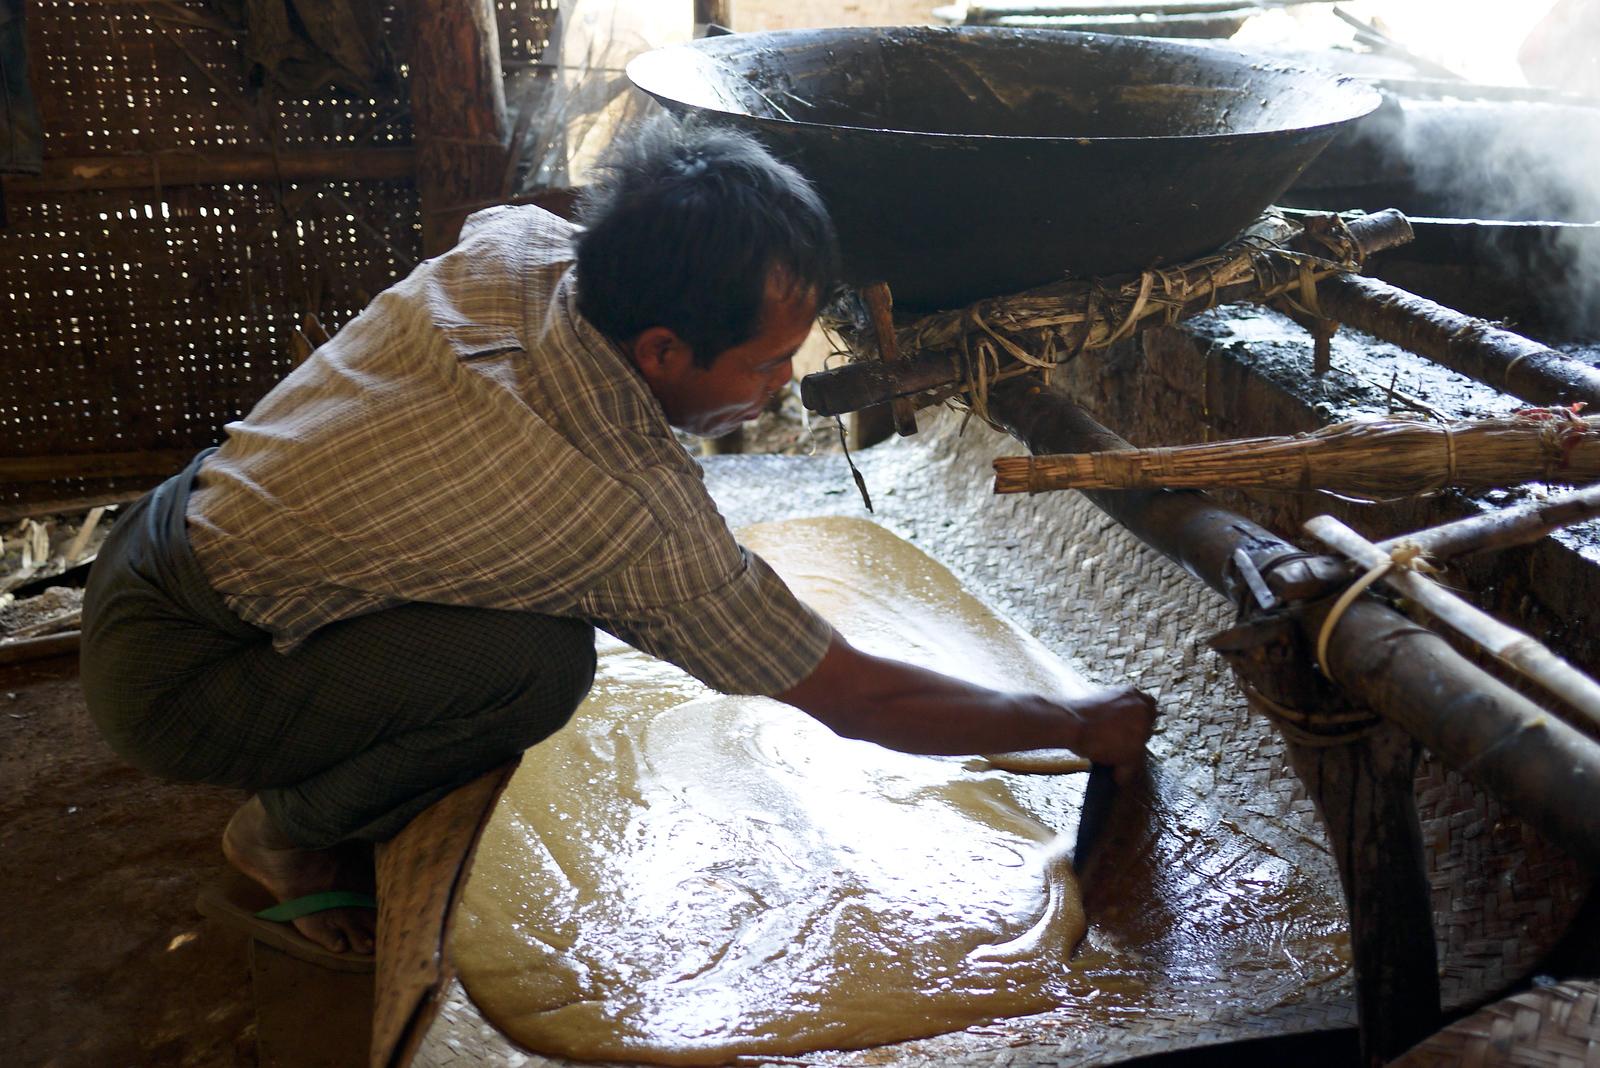 Spreading the boiled sugarcane juice, Inle Lake, Burma (Myanmar).